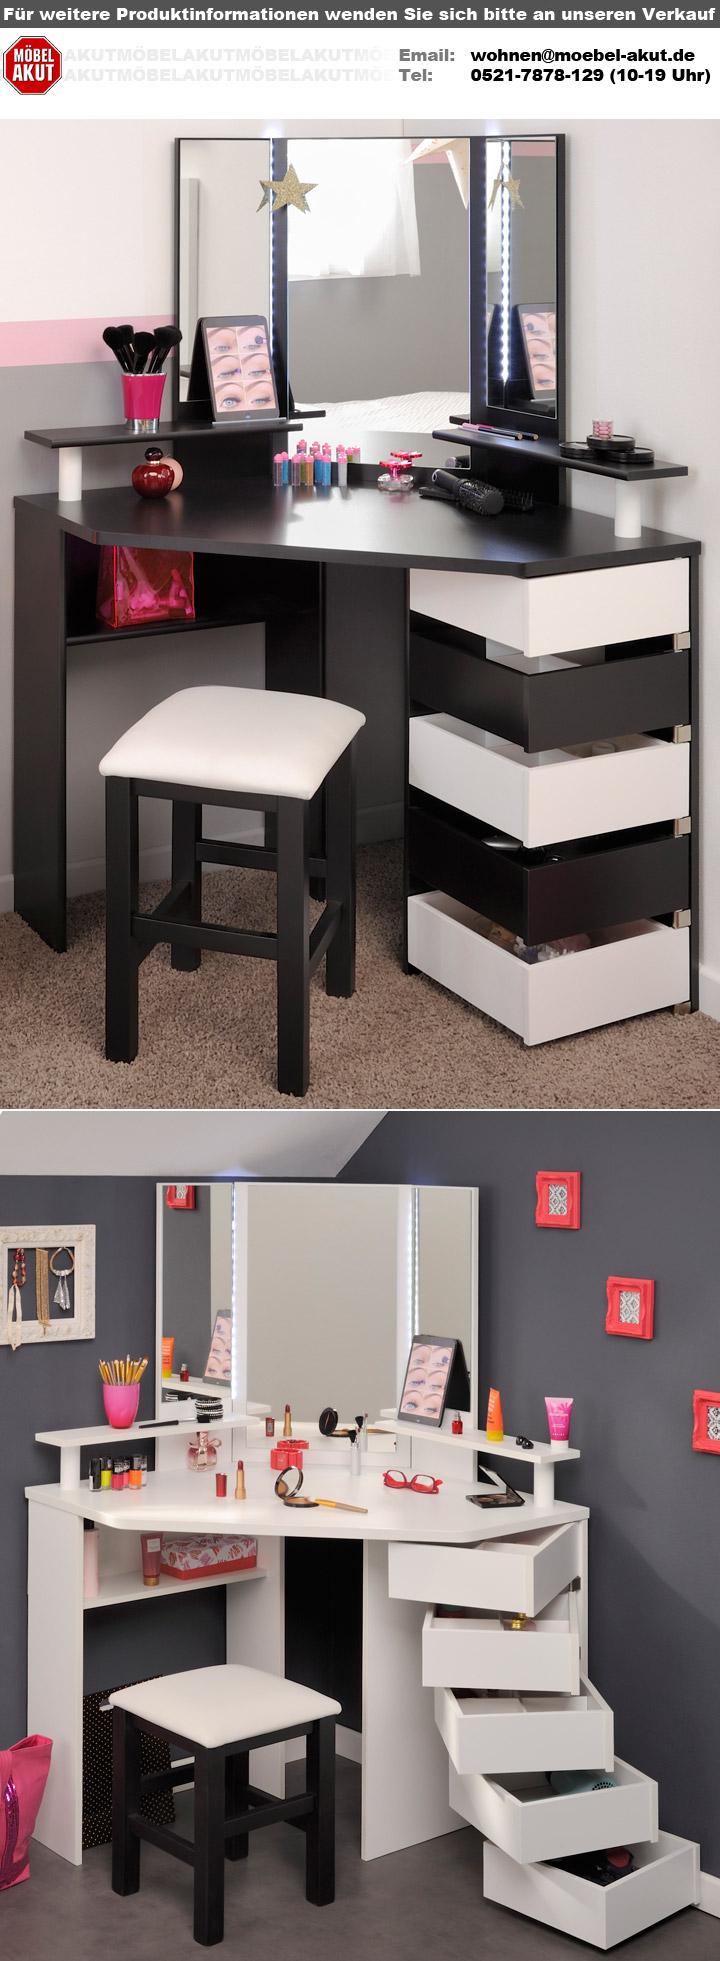 eck schminktisch volage in frisierkommode wei mit led beleuchtung. Black Bedroom Furniture Sets. Home Design Ideas